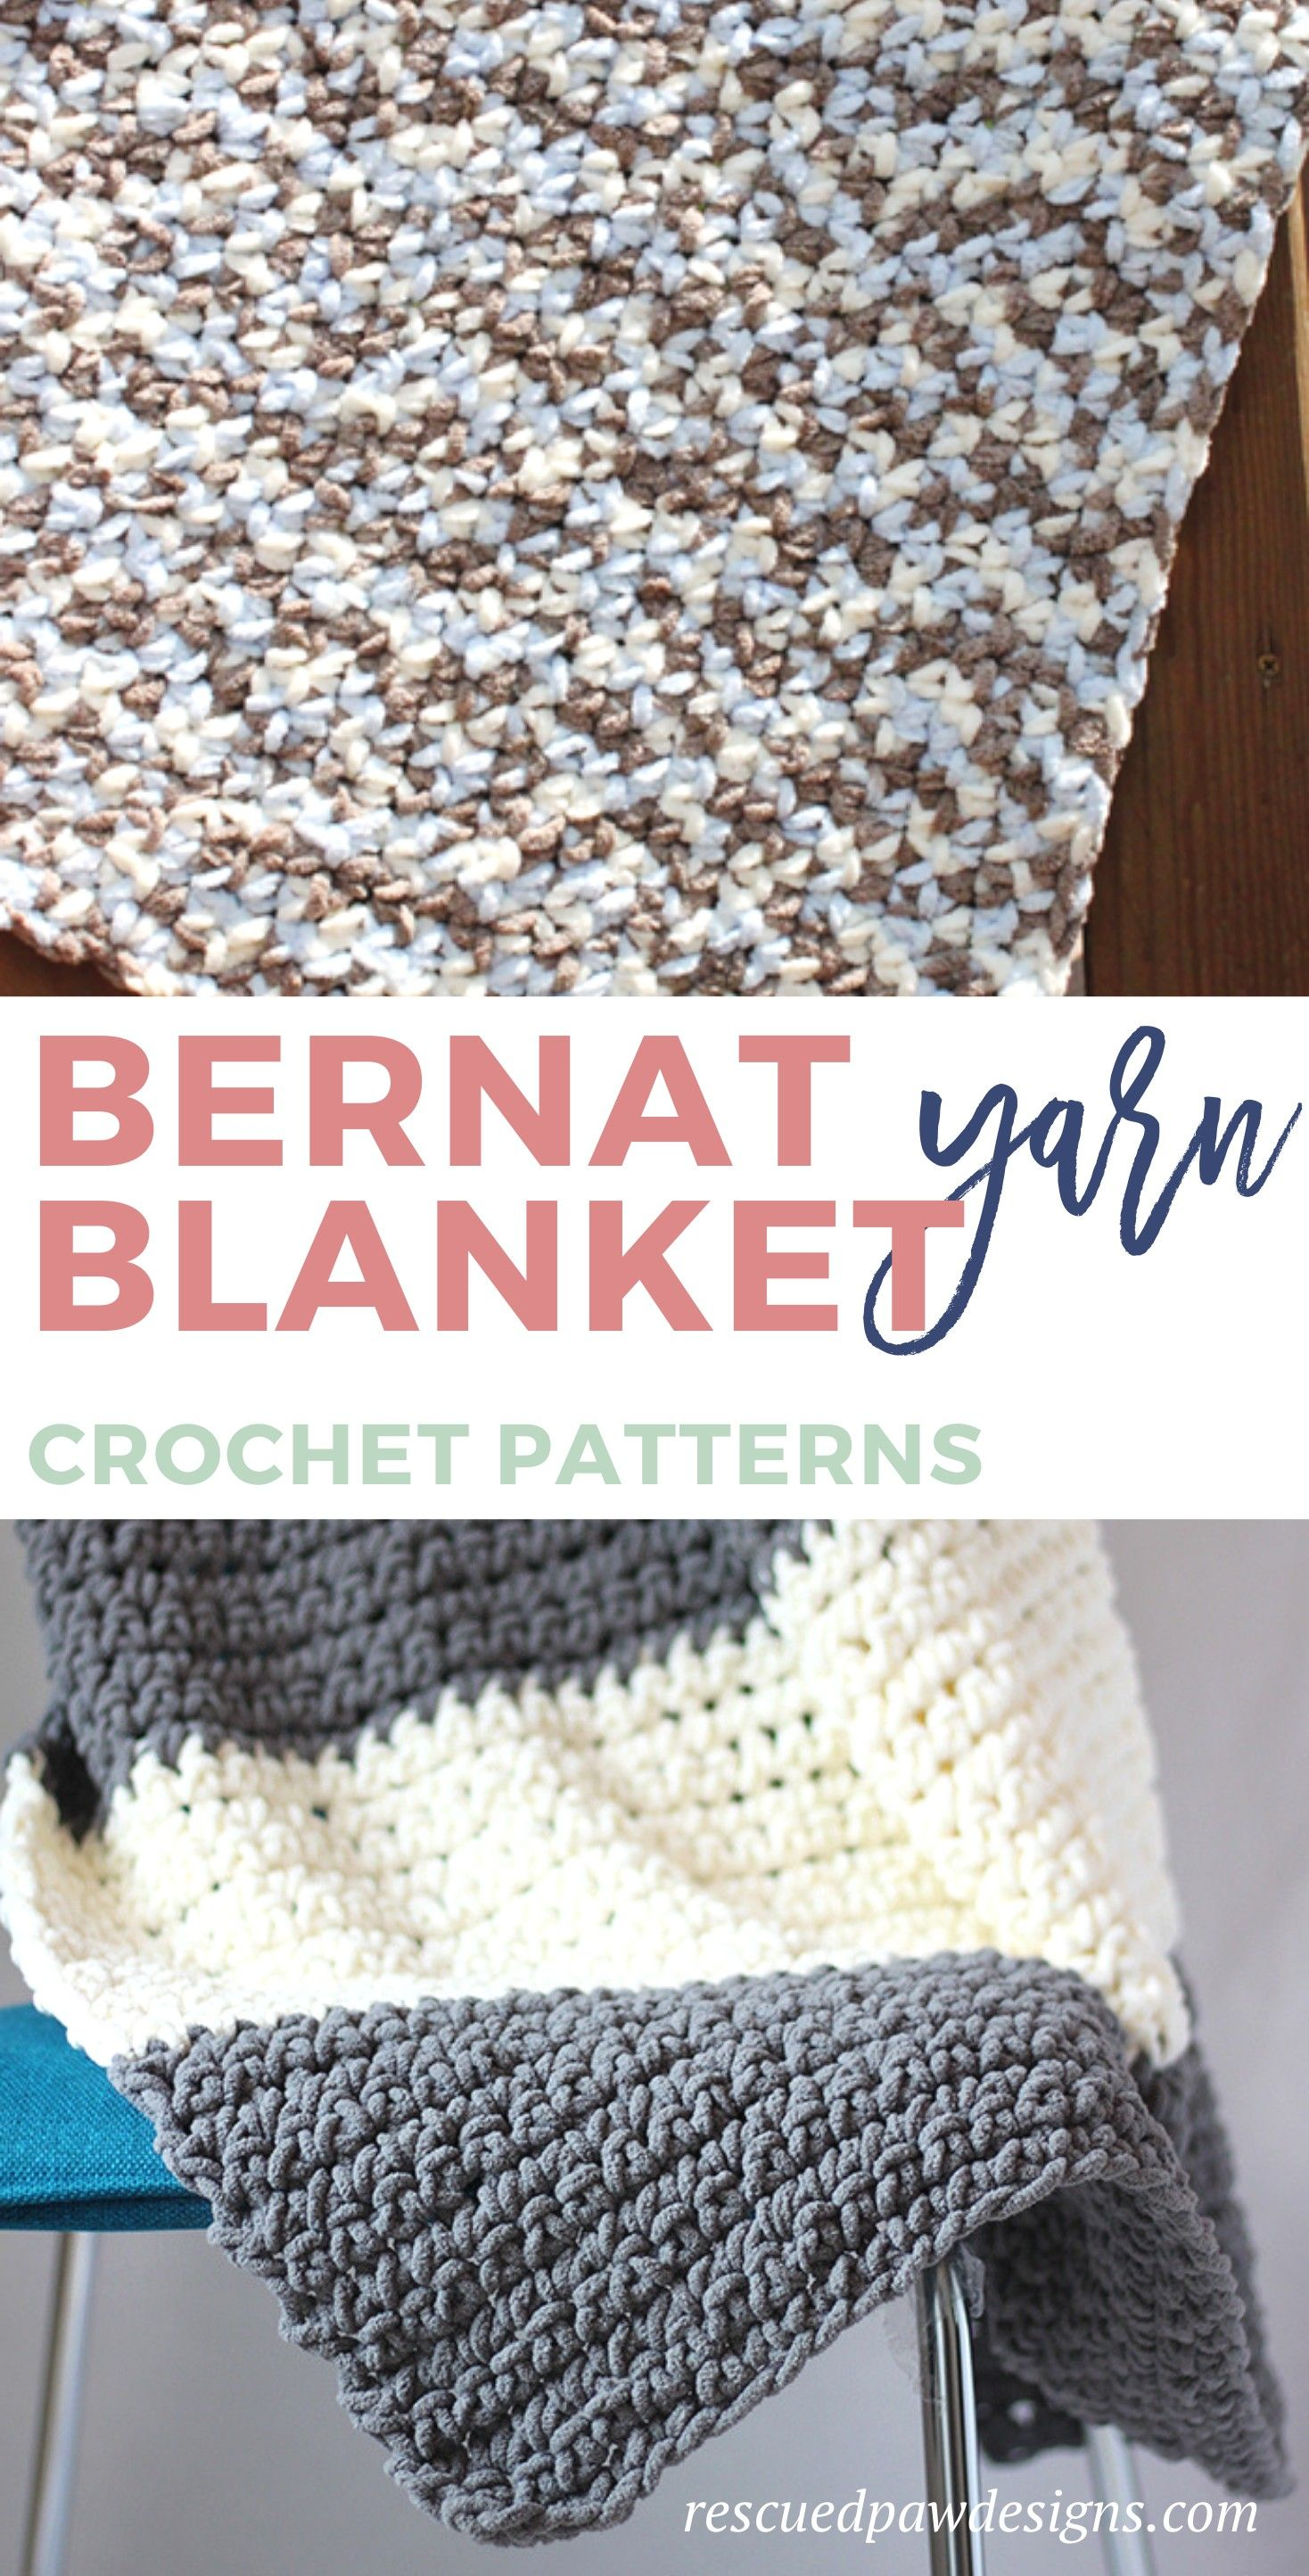 Bernat Blanket Yarn Crochet Patterns - EasyCrochet.com